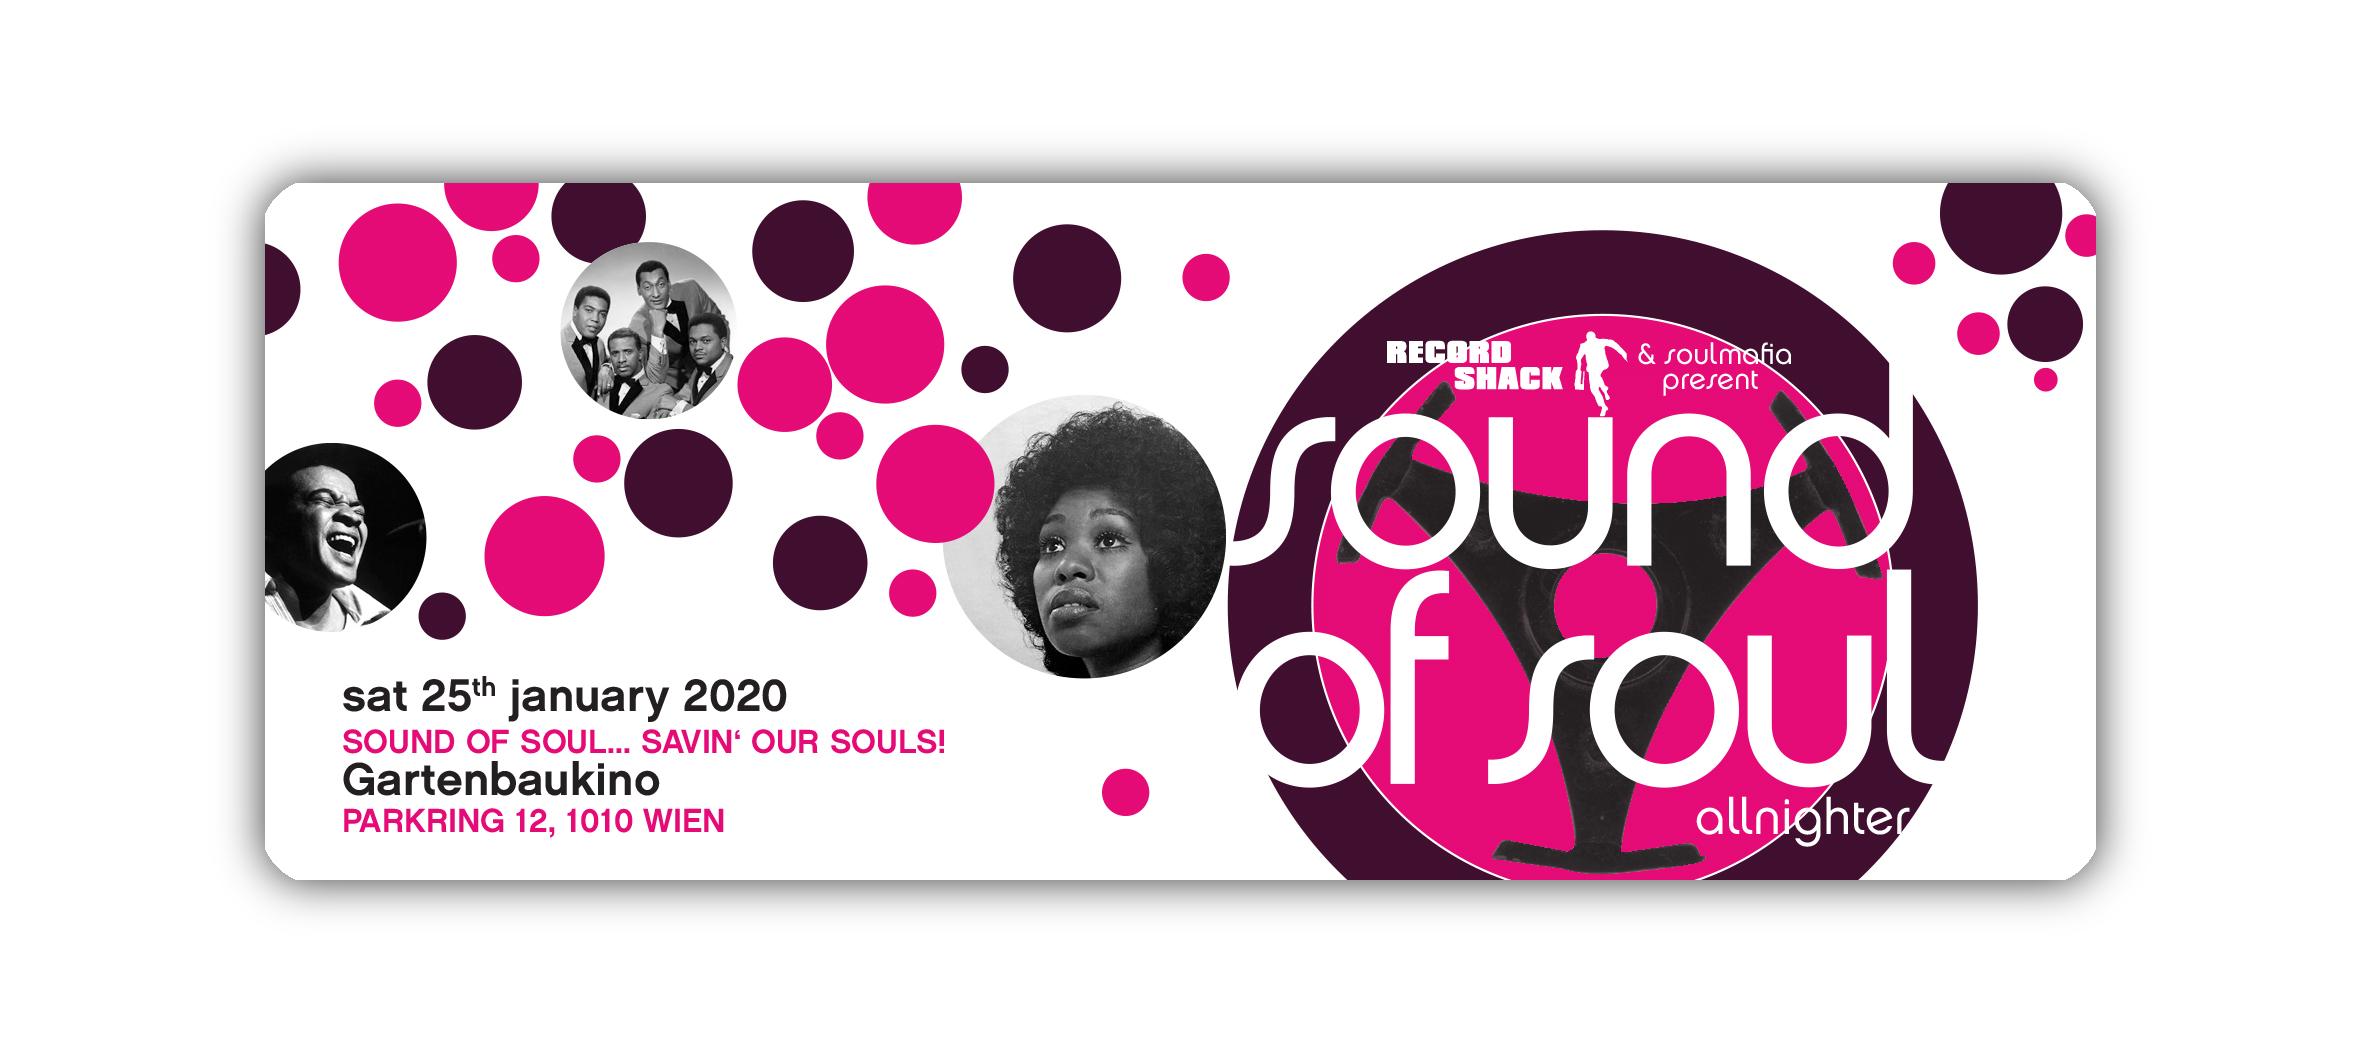 Sound Of Soul '20 All-Nighter am 25. January 2020 @ Gartenbaukino.